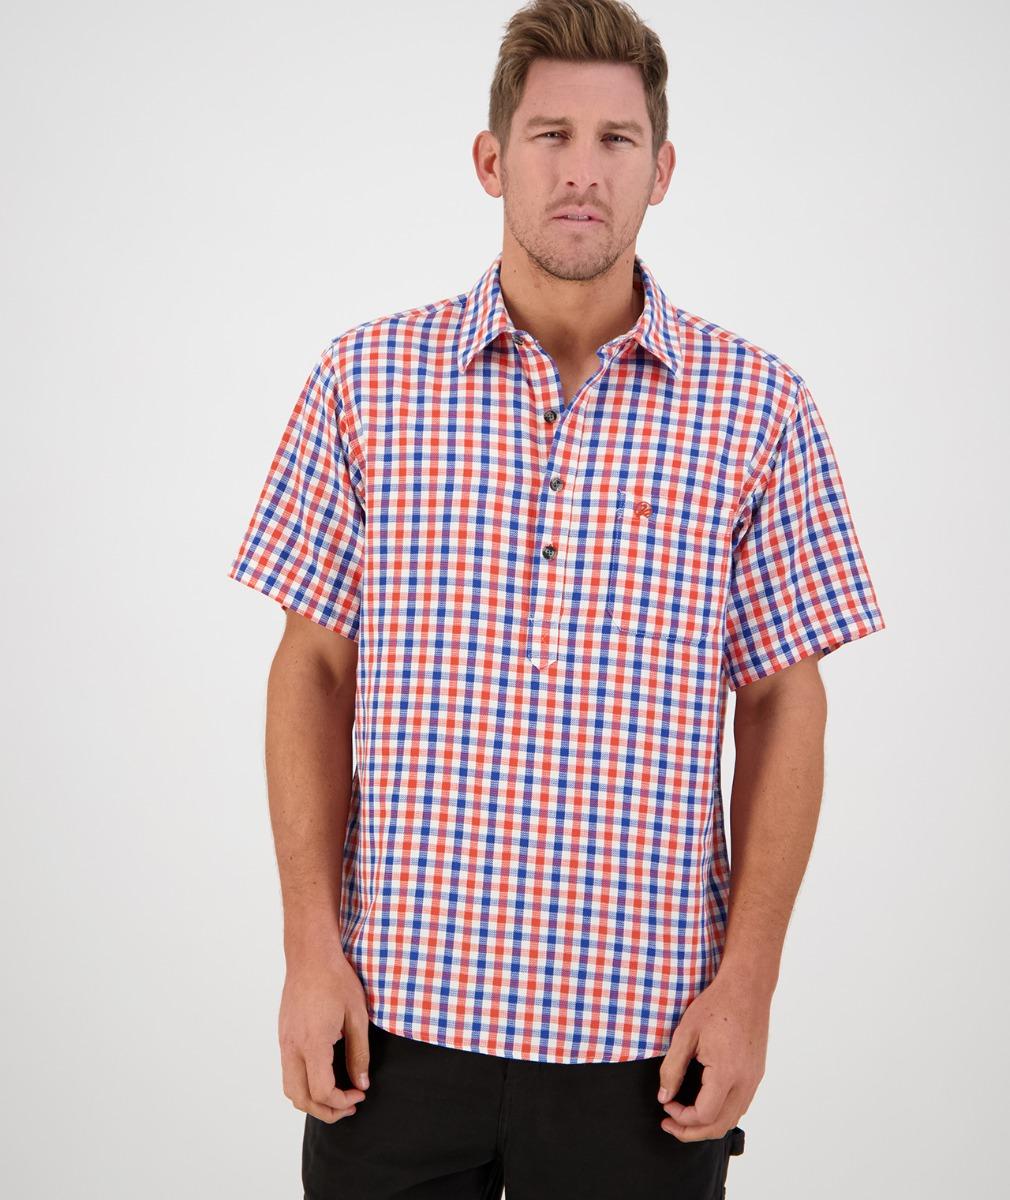 Swanndri Men's Paihia Short Sleeve Shirt in Orange/Blue